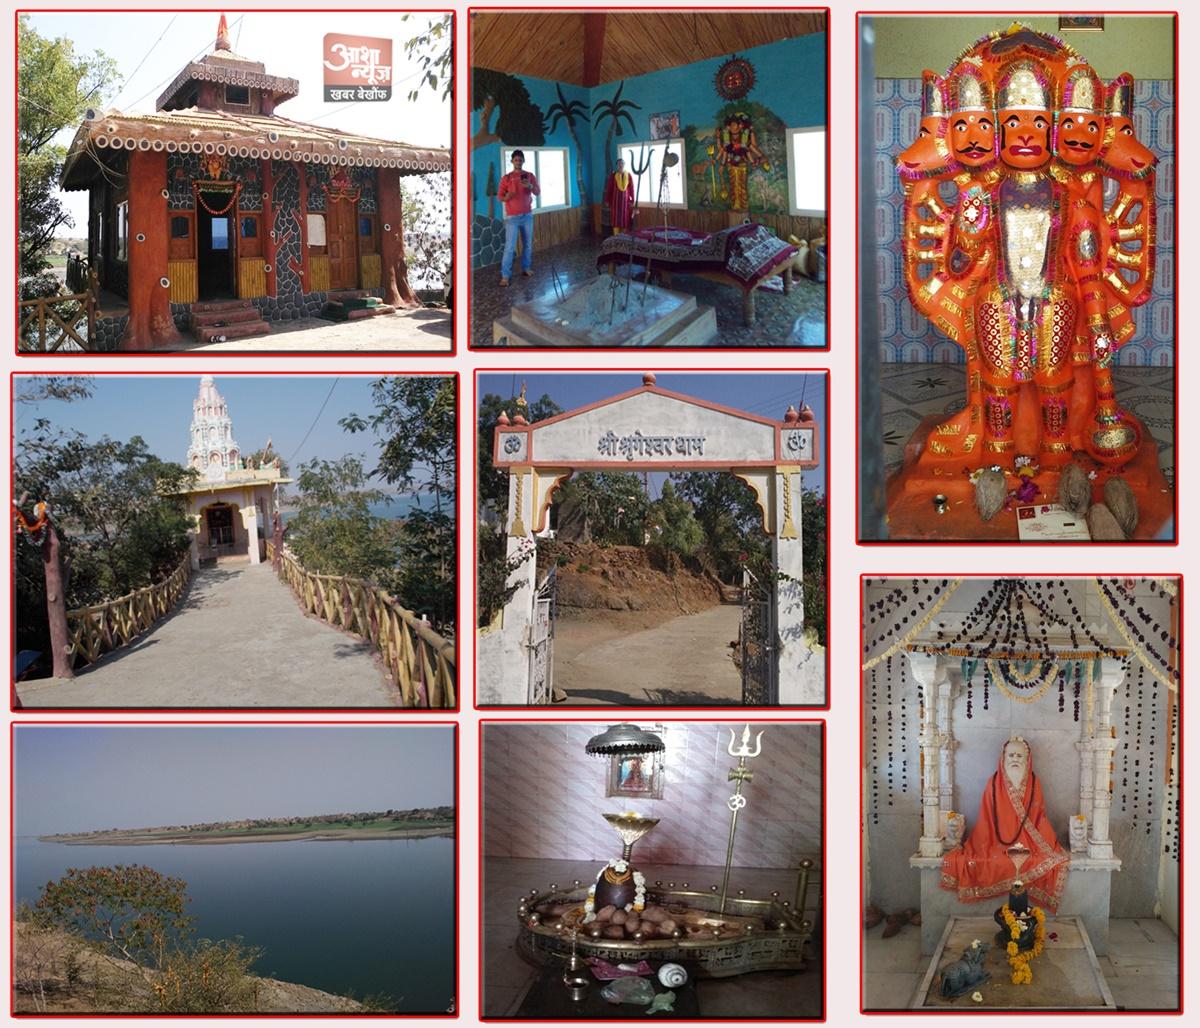 shrangeshwar dhaam petlawad jhaknawada jhabua-श्रृंगेश्वर धाम झकनावदा पेटलावद